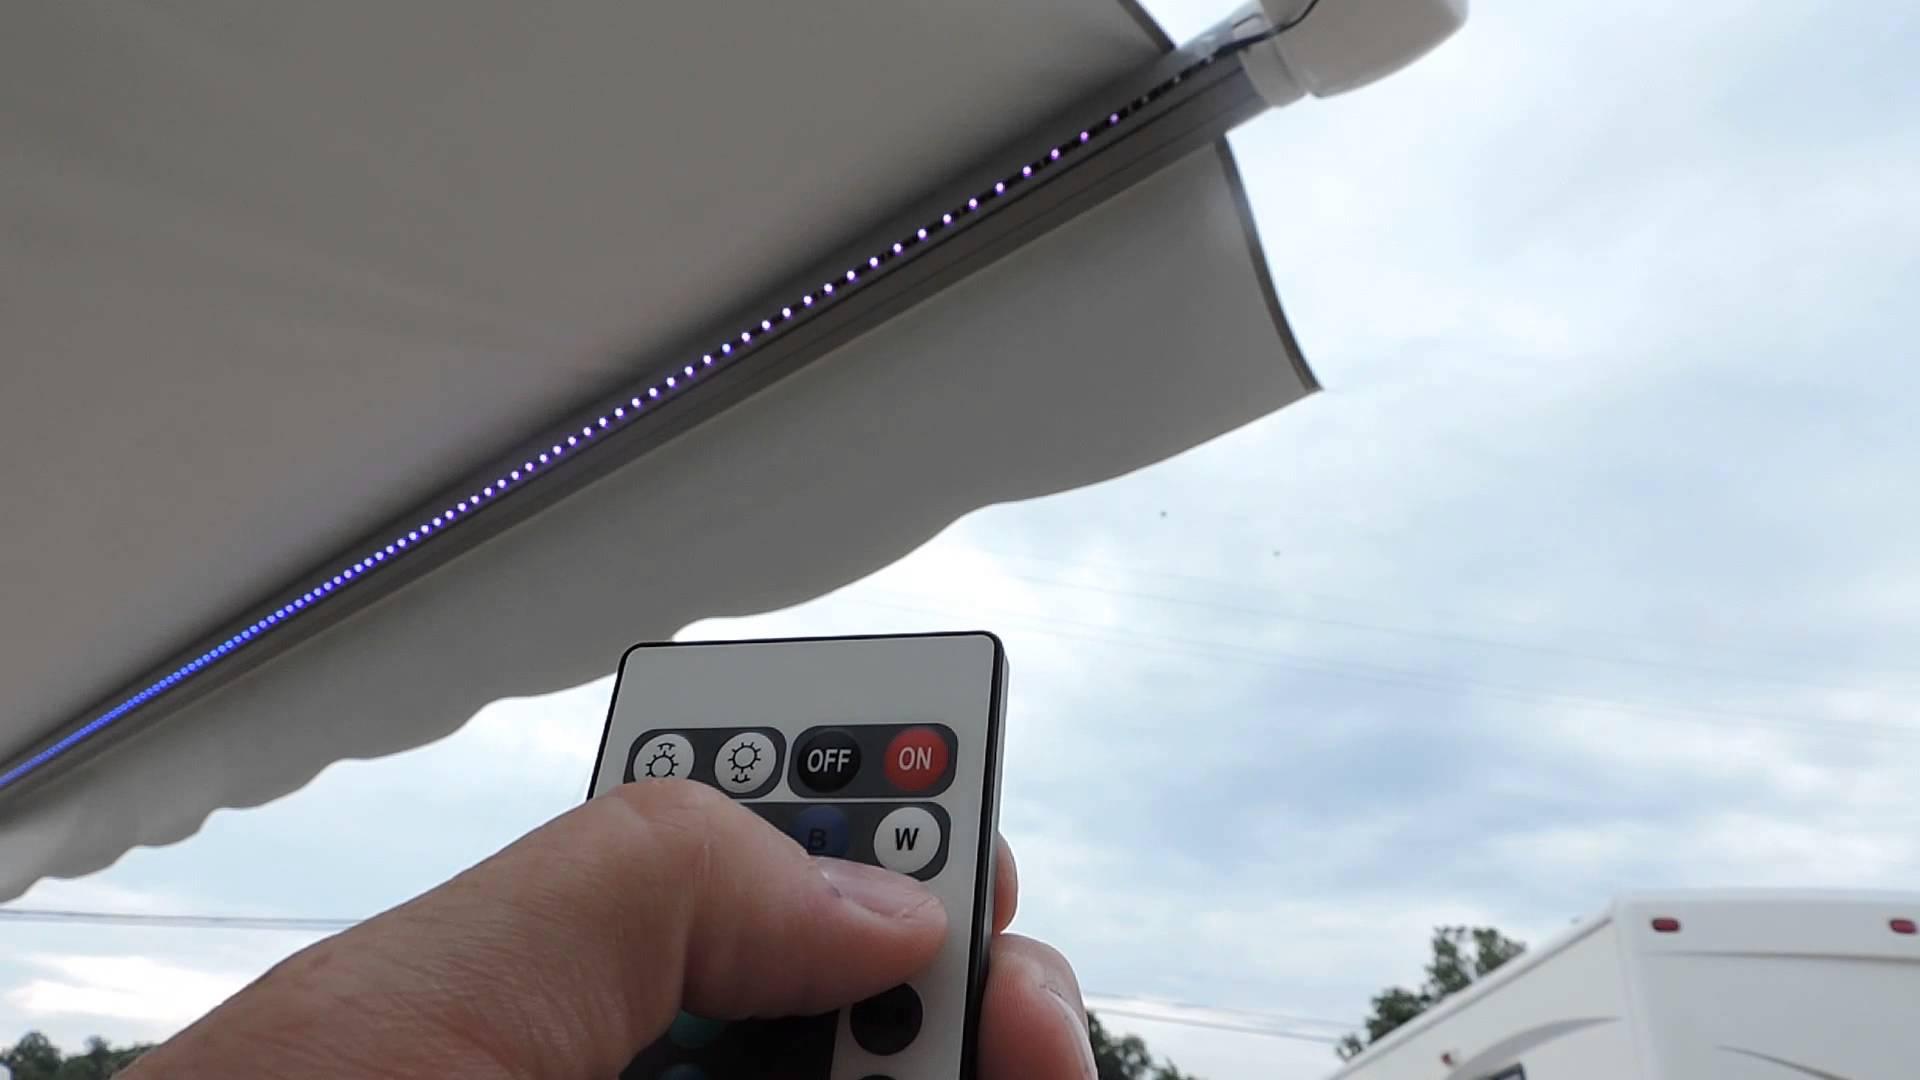 awning lights new led awning light kit installed!!! - youtube QQEVIDR